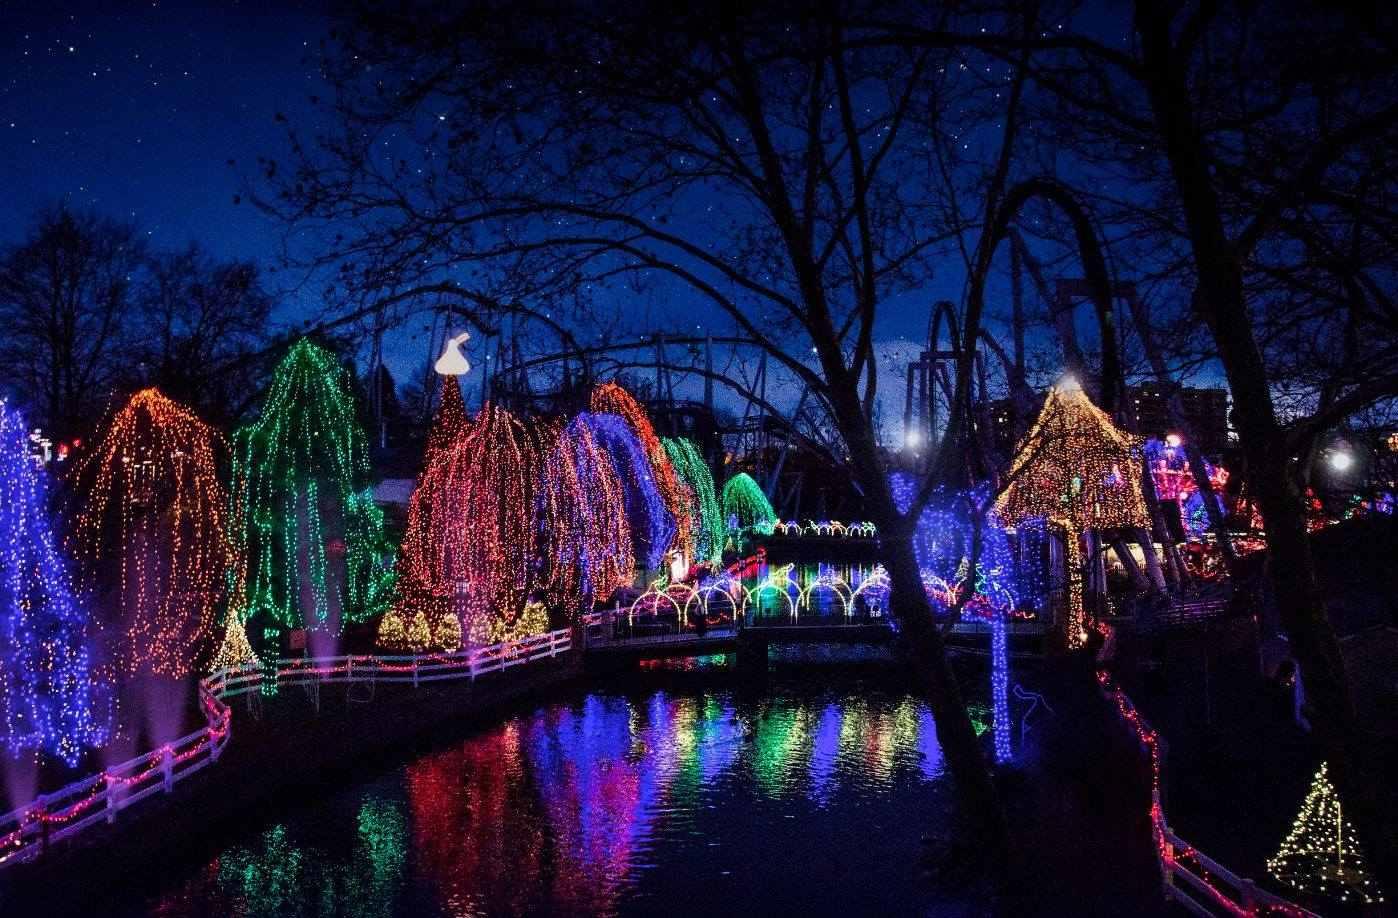 Christmas Candylane at Hersheypark